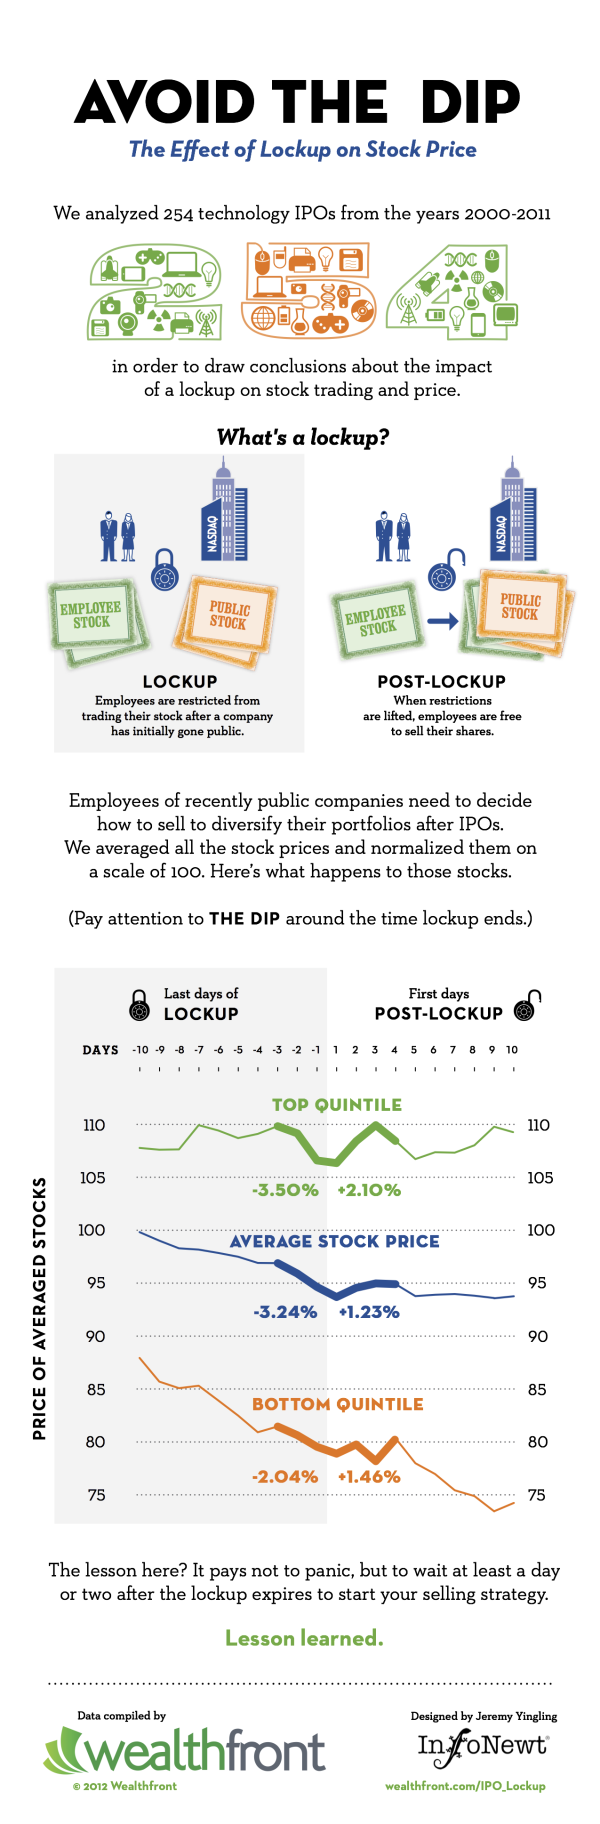 Wealthfront Lockup Avoid the Dip infographic